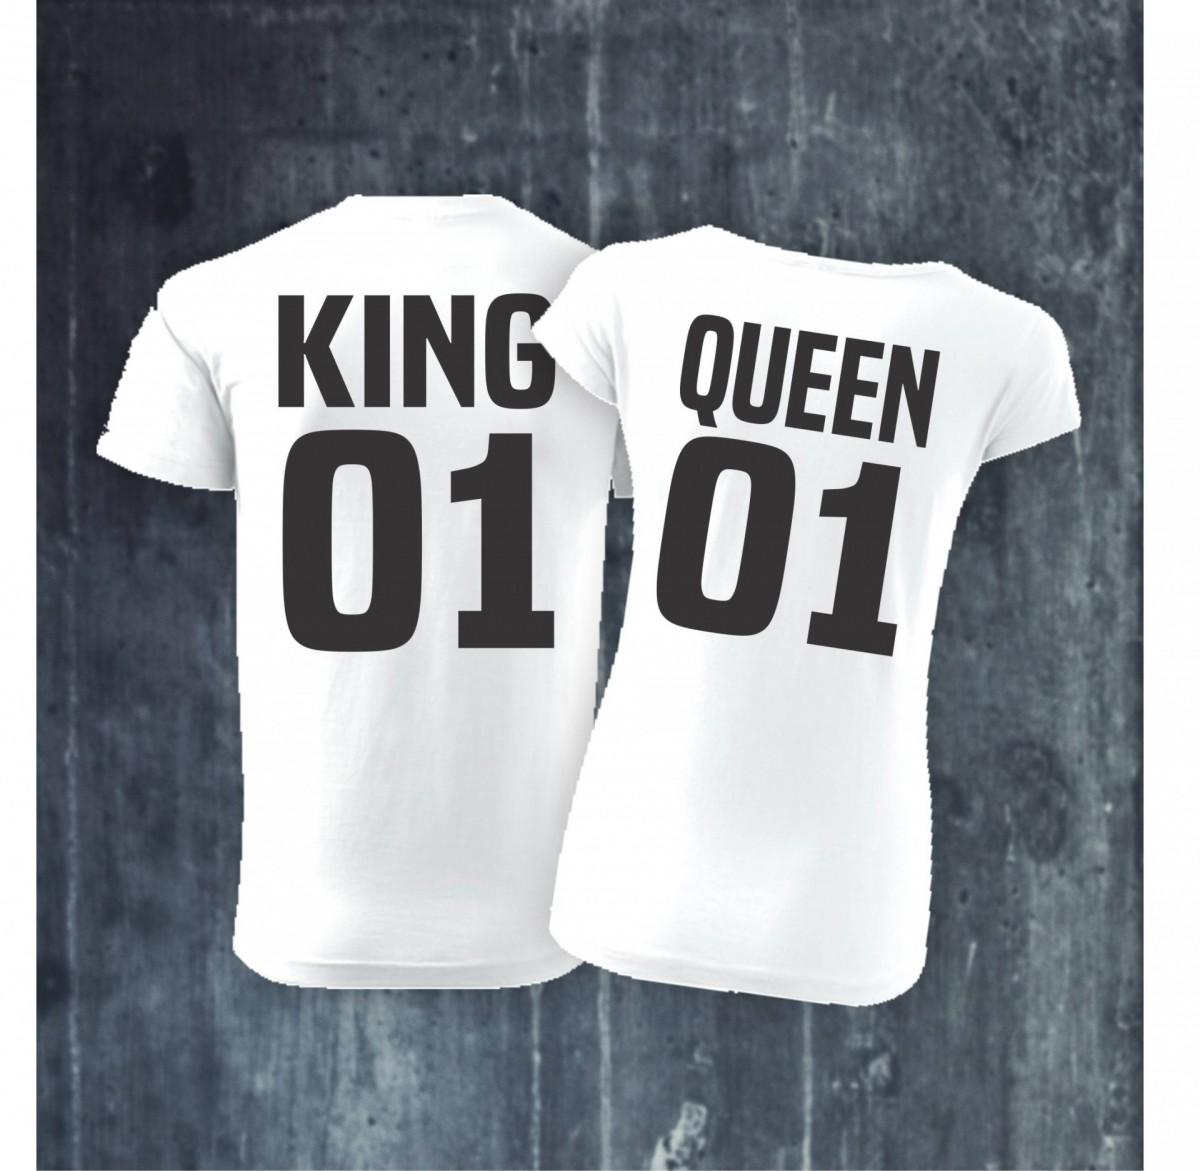 Pánské   dámské tričko KING 01 - QUEEN 01 ǀ Fajntričko.cz c9e0a106c6